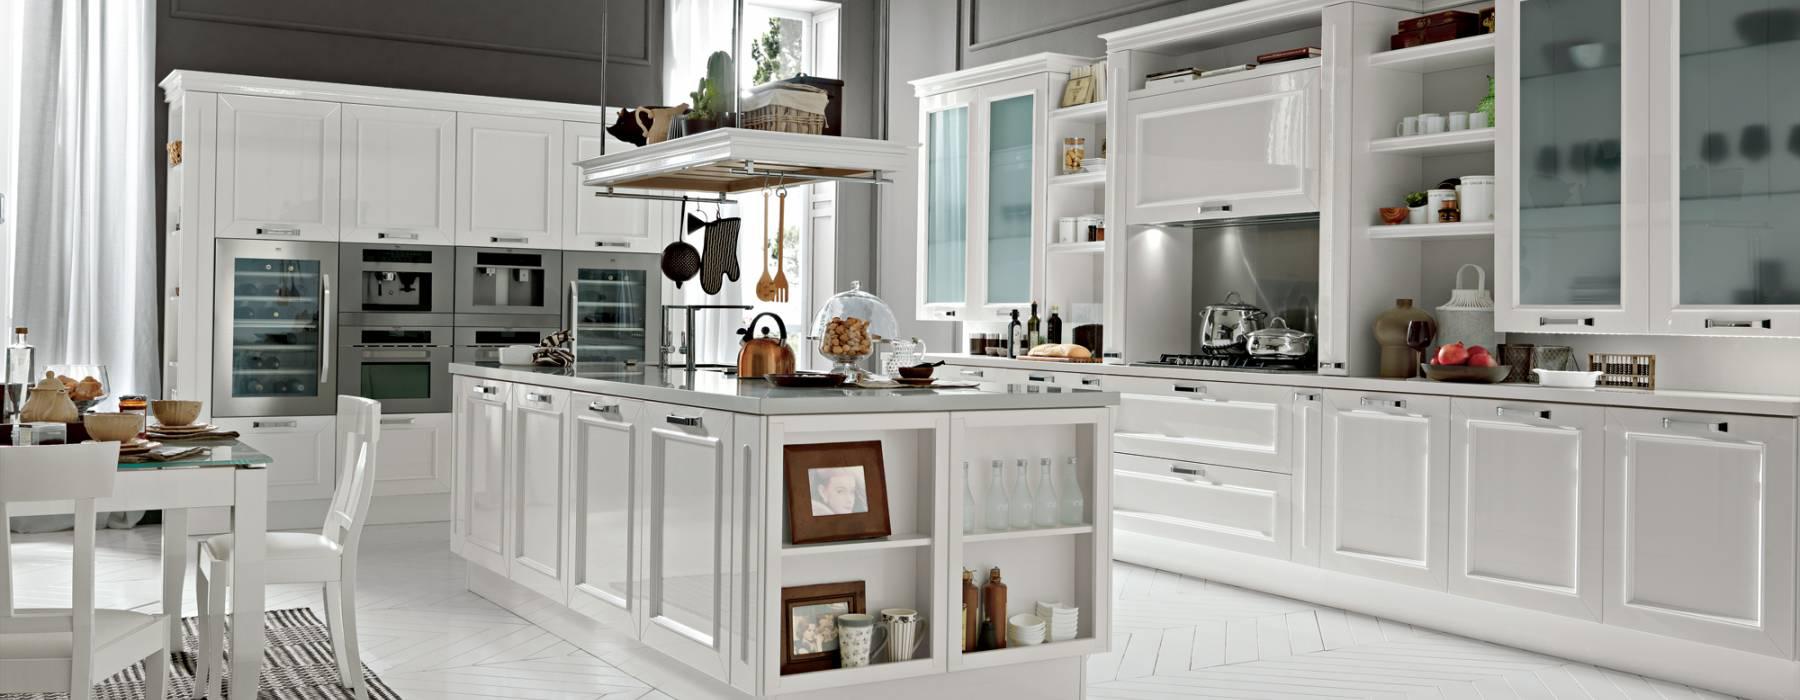 Le cucine in stile provenzale e industrial chic febal 2015 - Febal cucine classiche ...